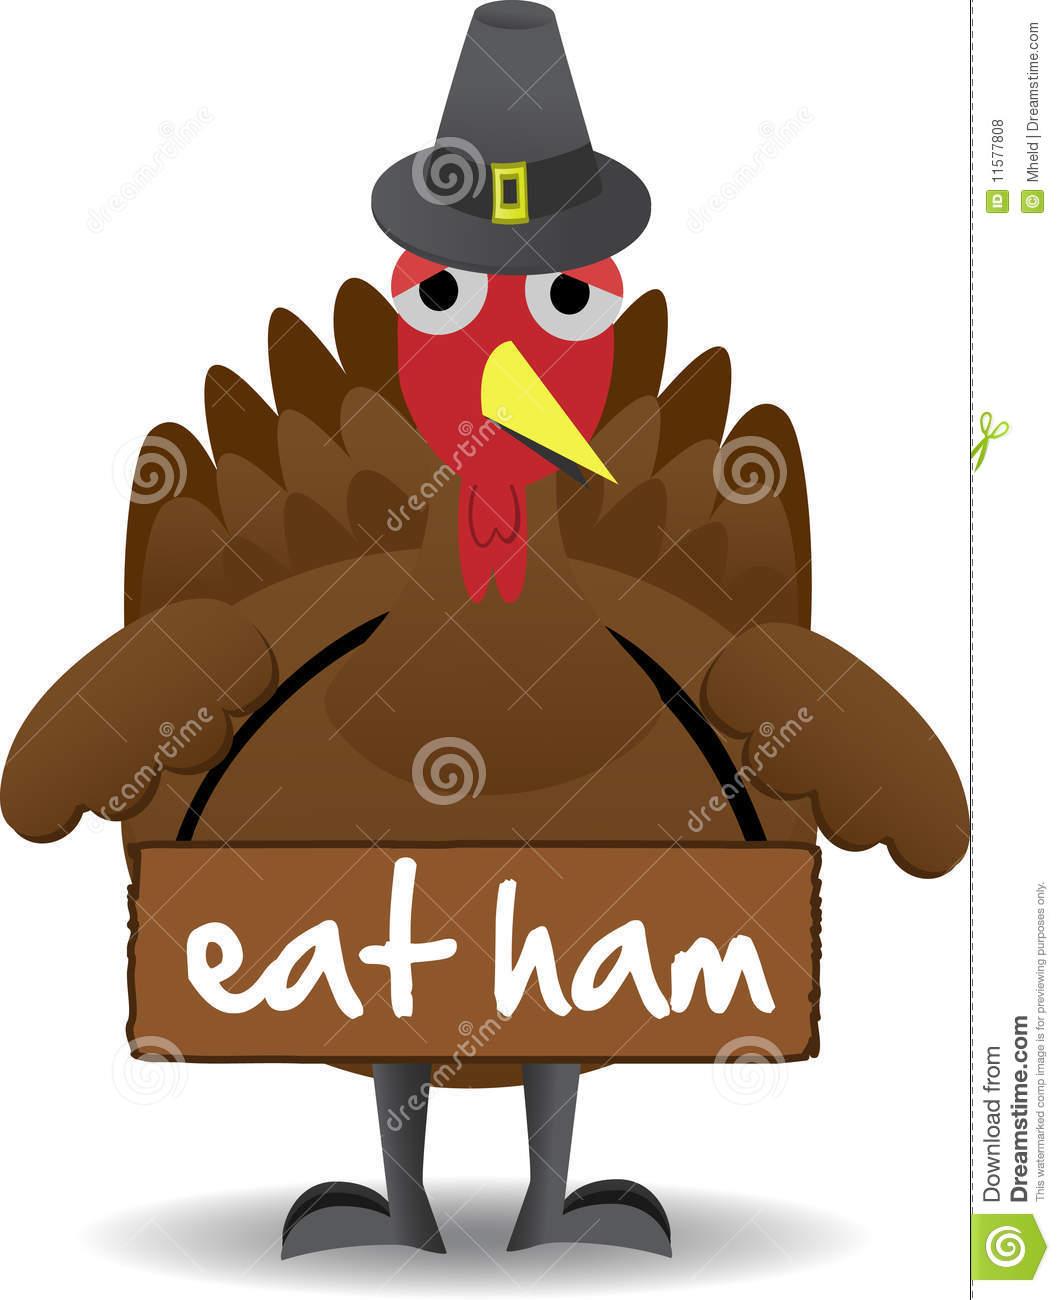 Eat More Ham Clipart.